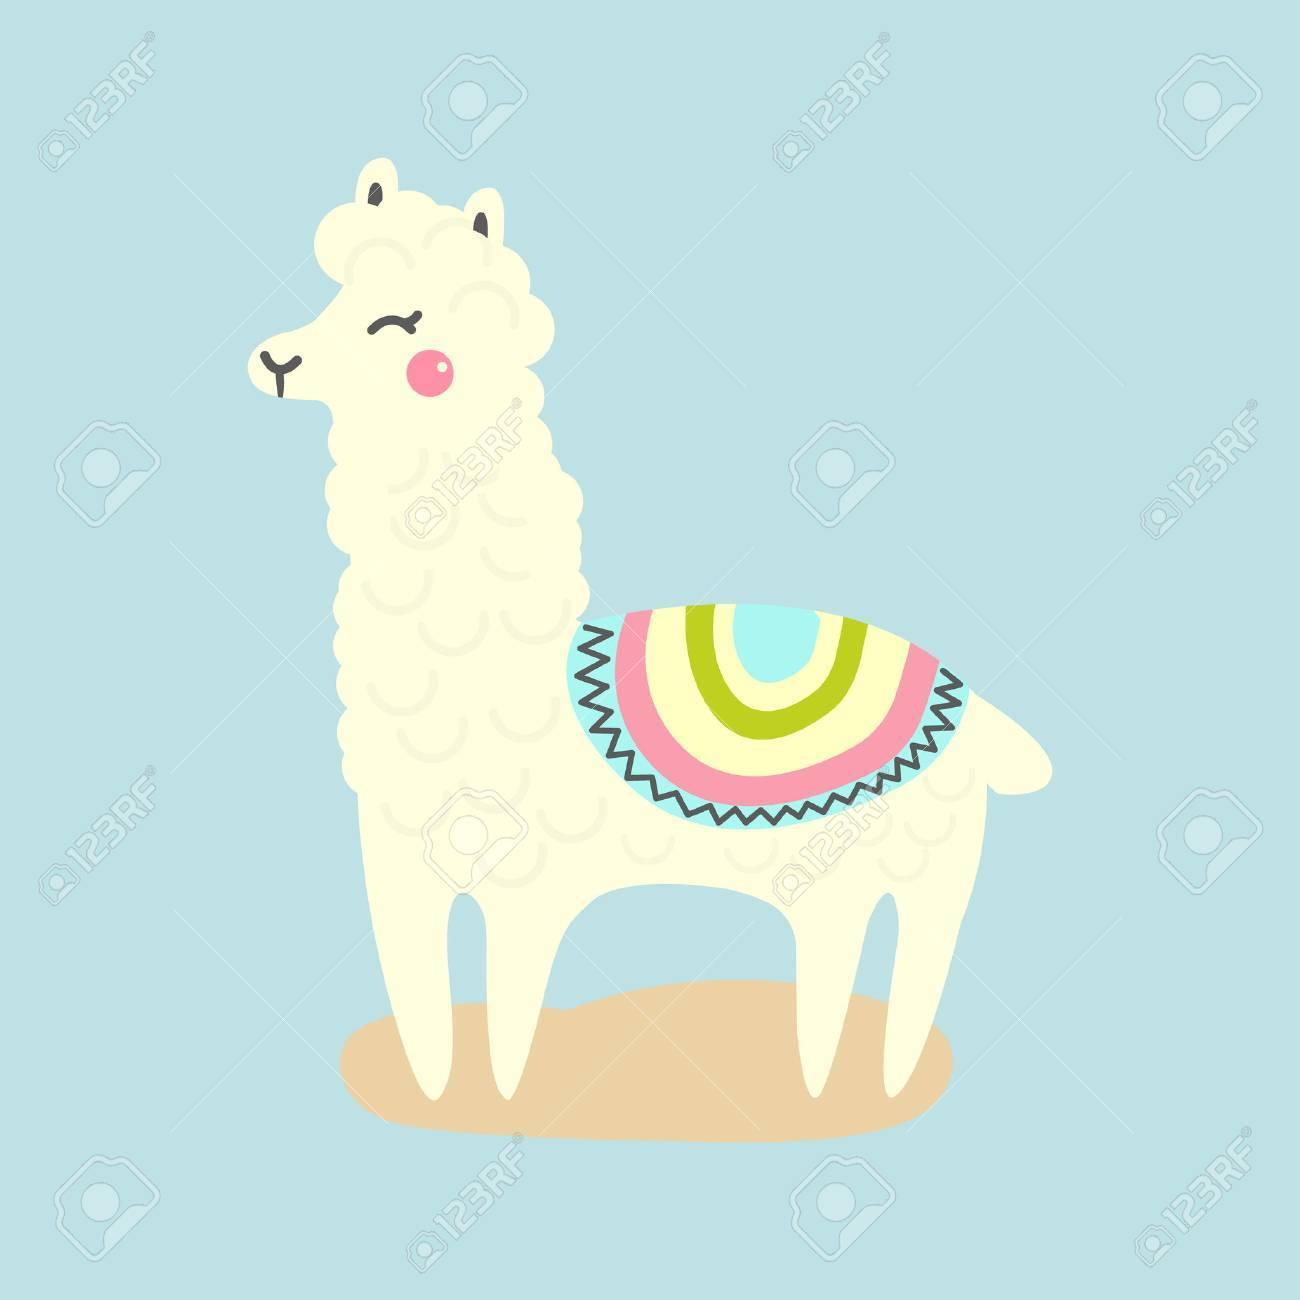 Vector Cute Llama Or Alpaca Illustration Funny Animal